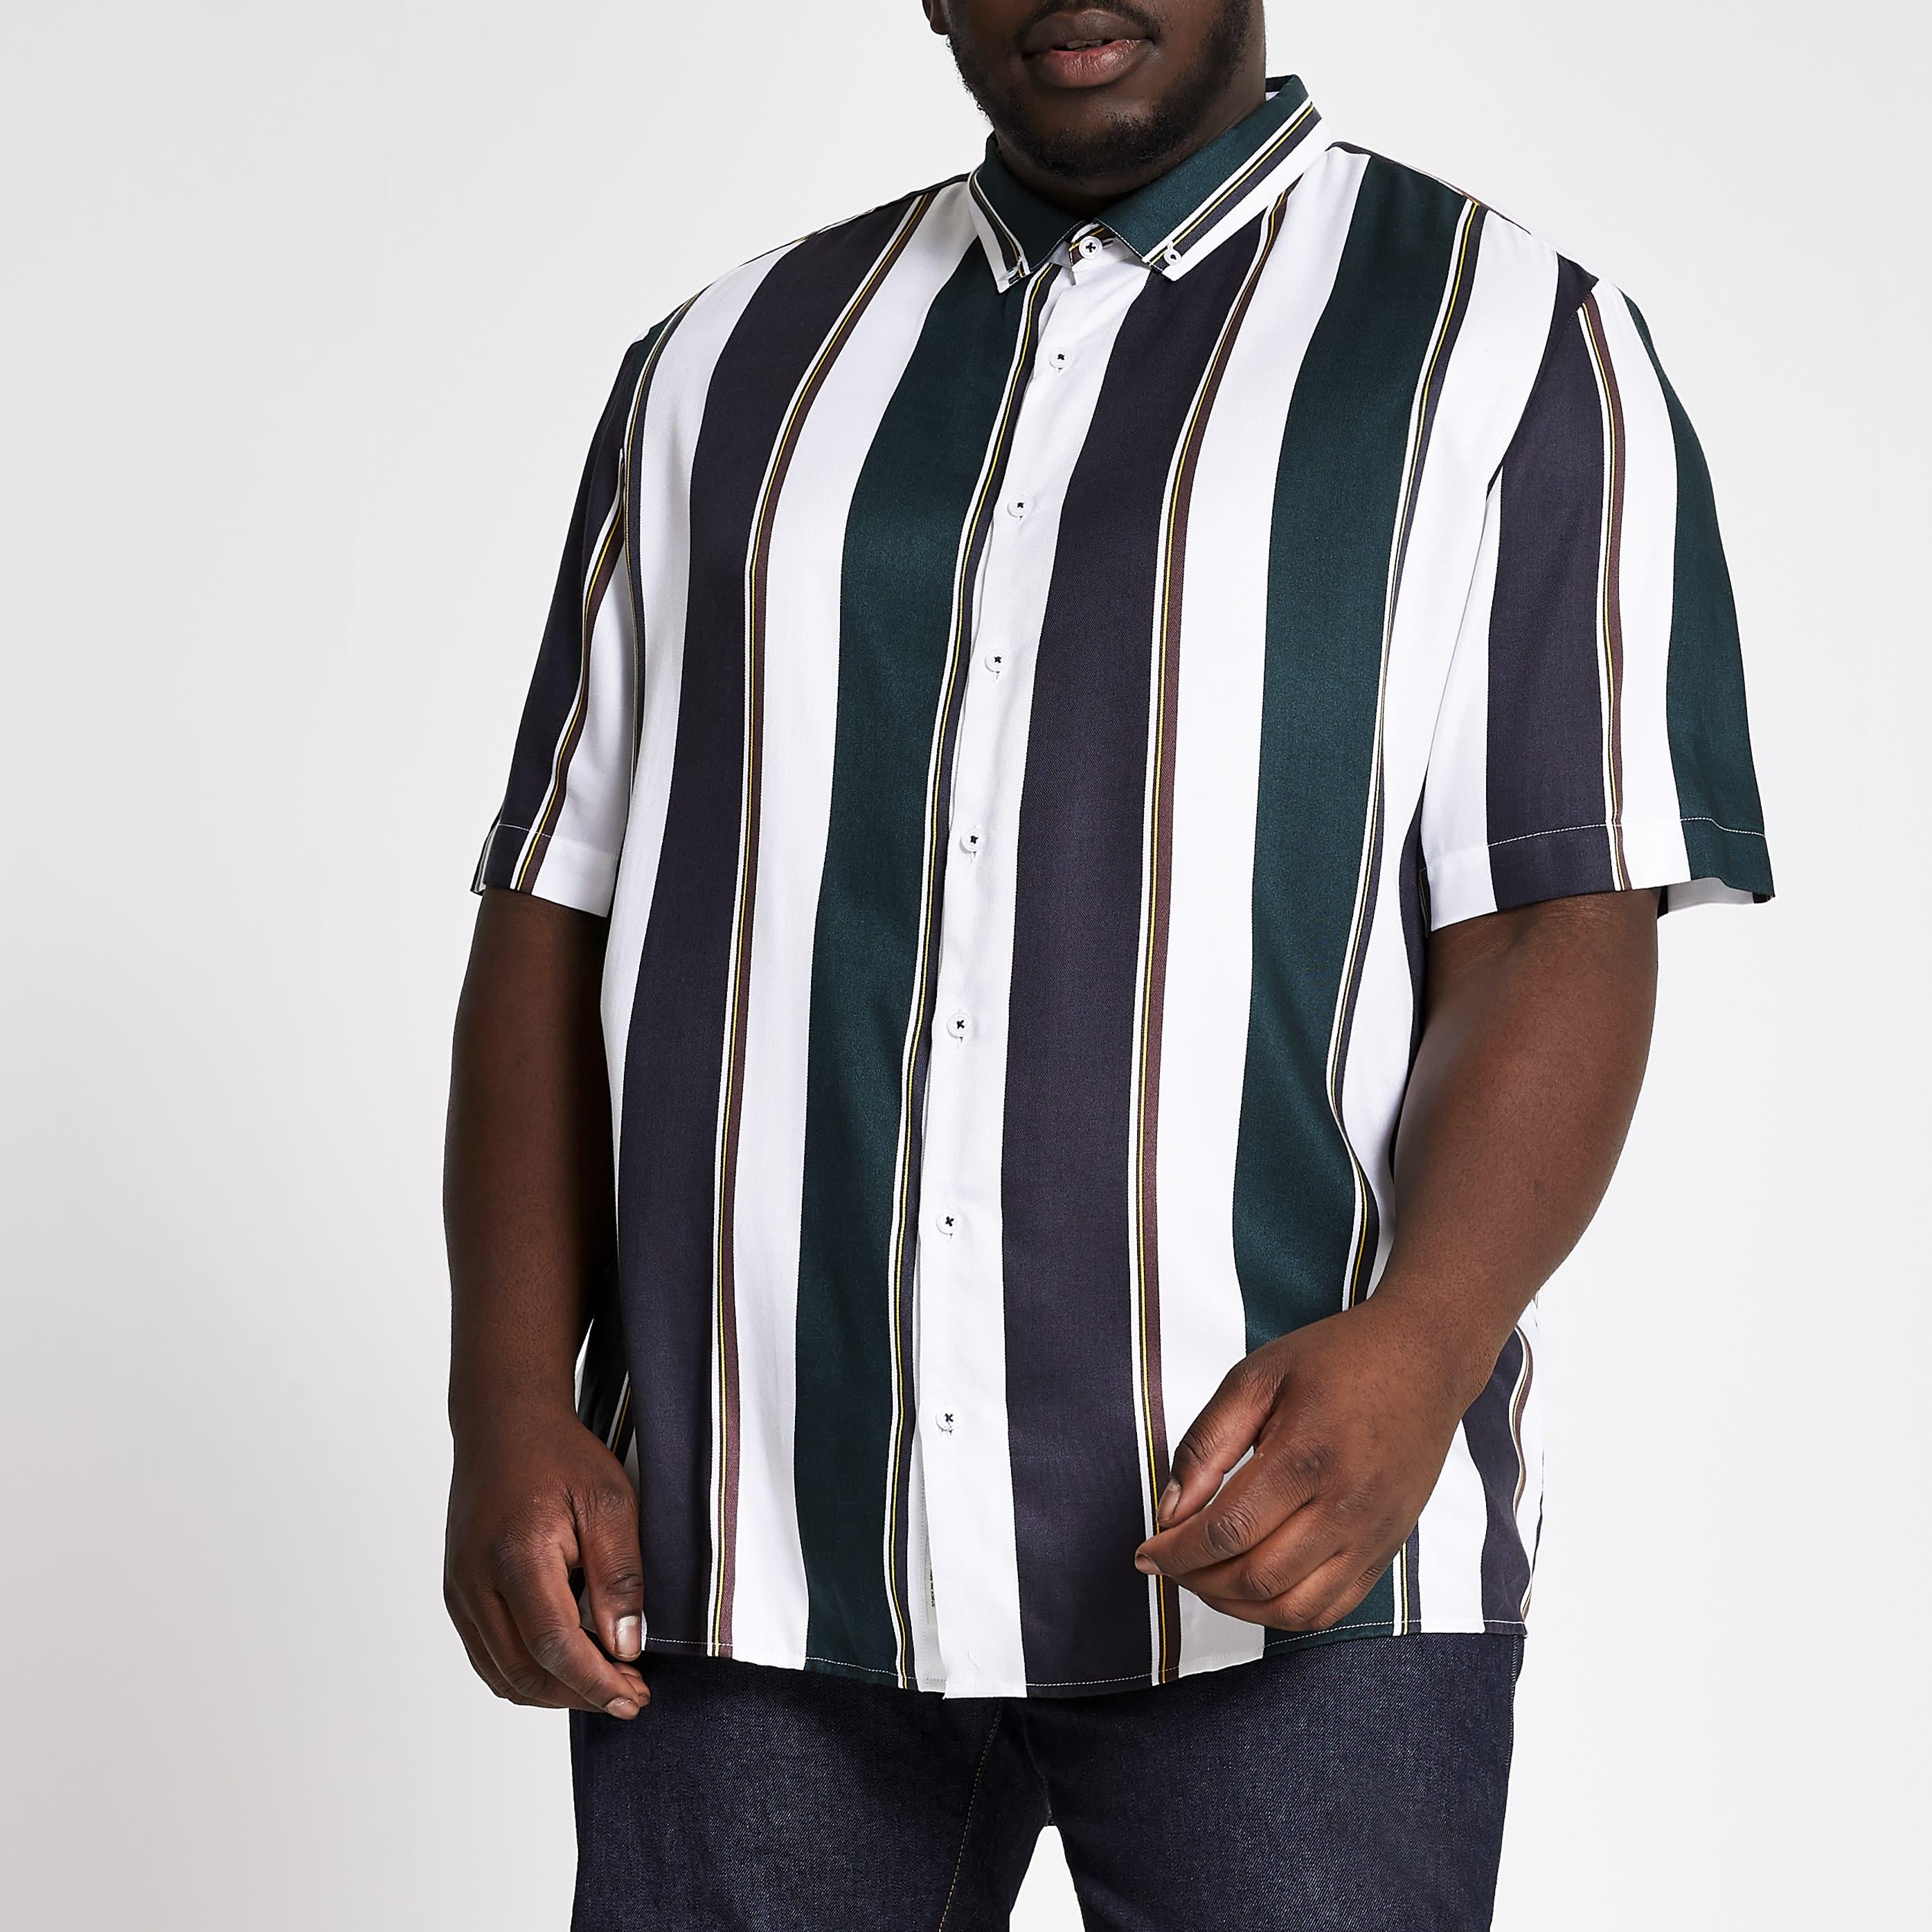 8c0cbf5250344b Short Sleeve Dress Shirts Mens Big And Tall